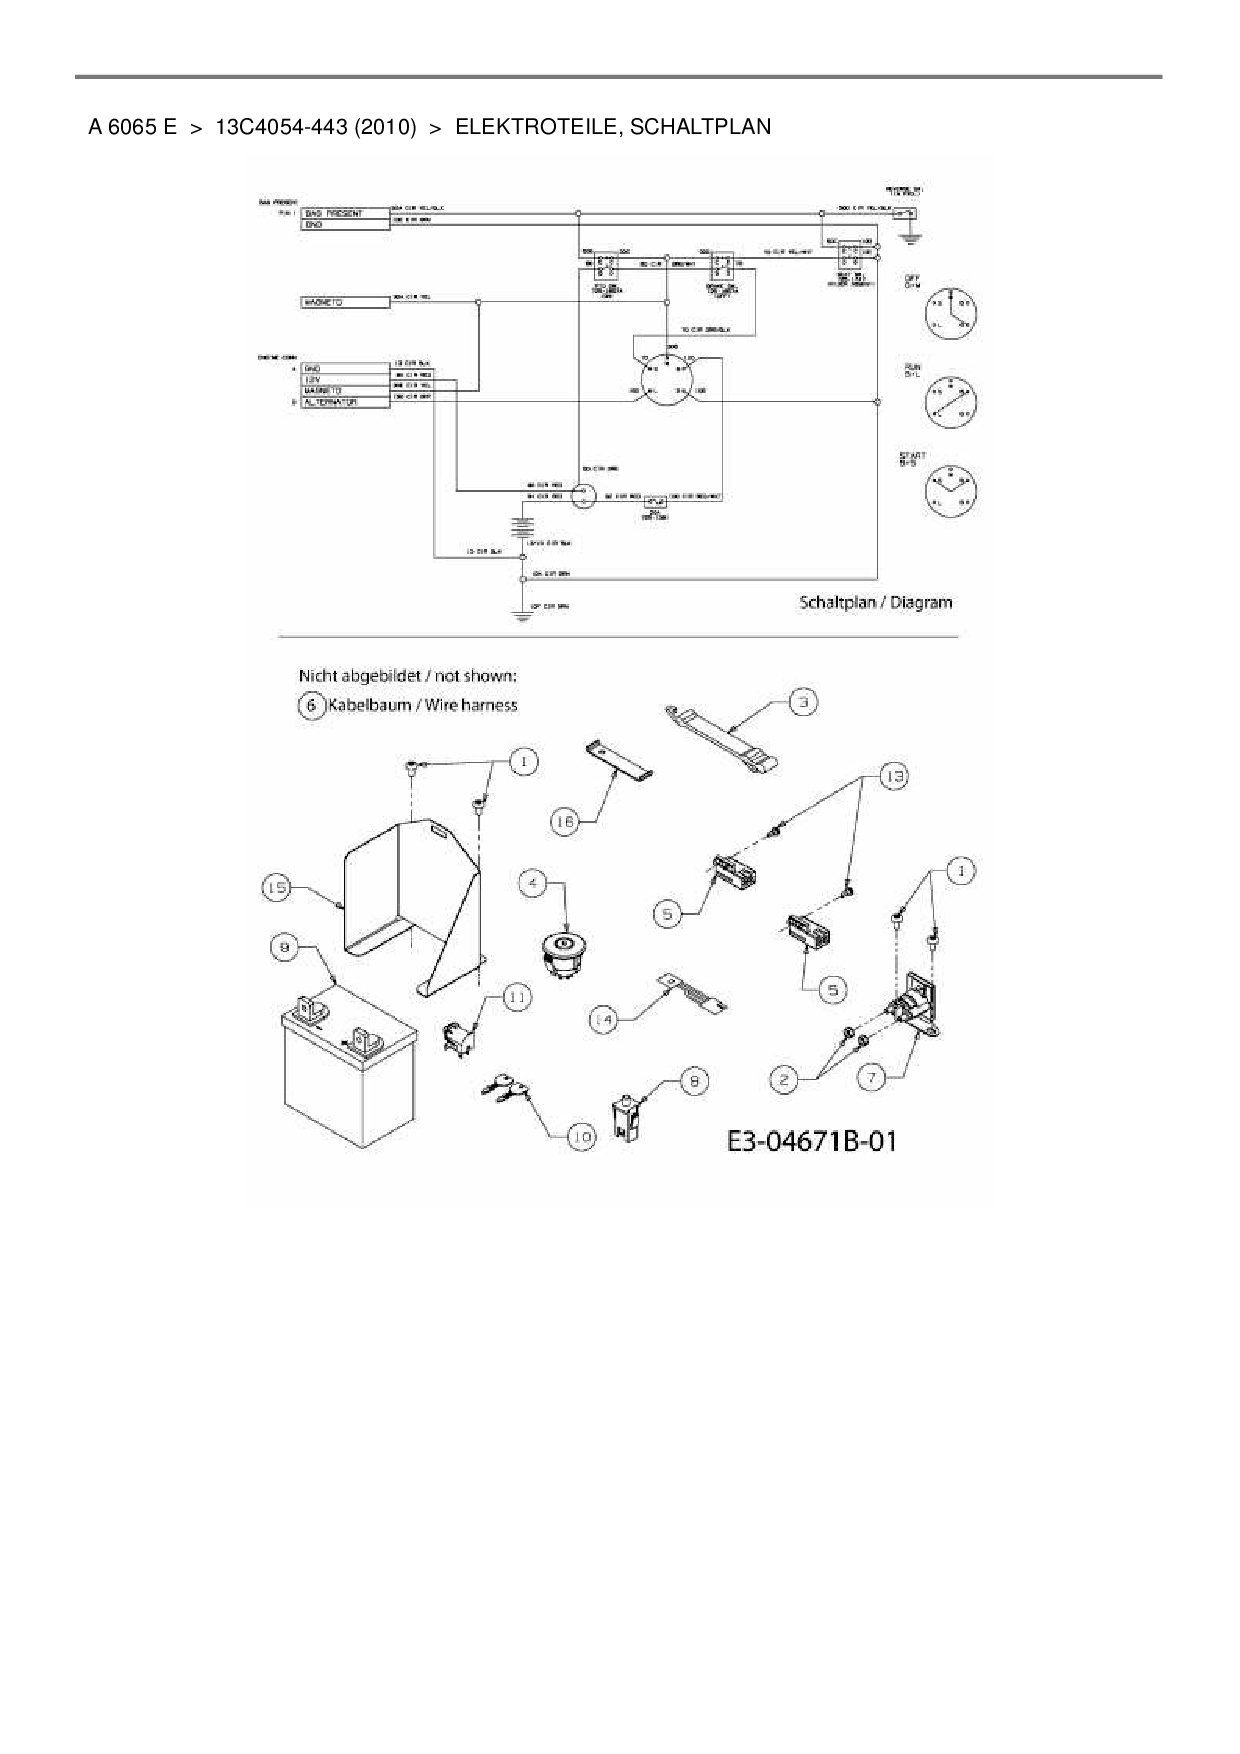 Berühmt Handwerker Rasentraktor Schaltplan Ideen - Elektrische ...